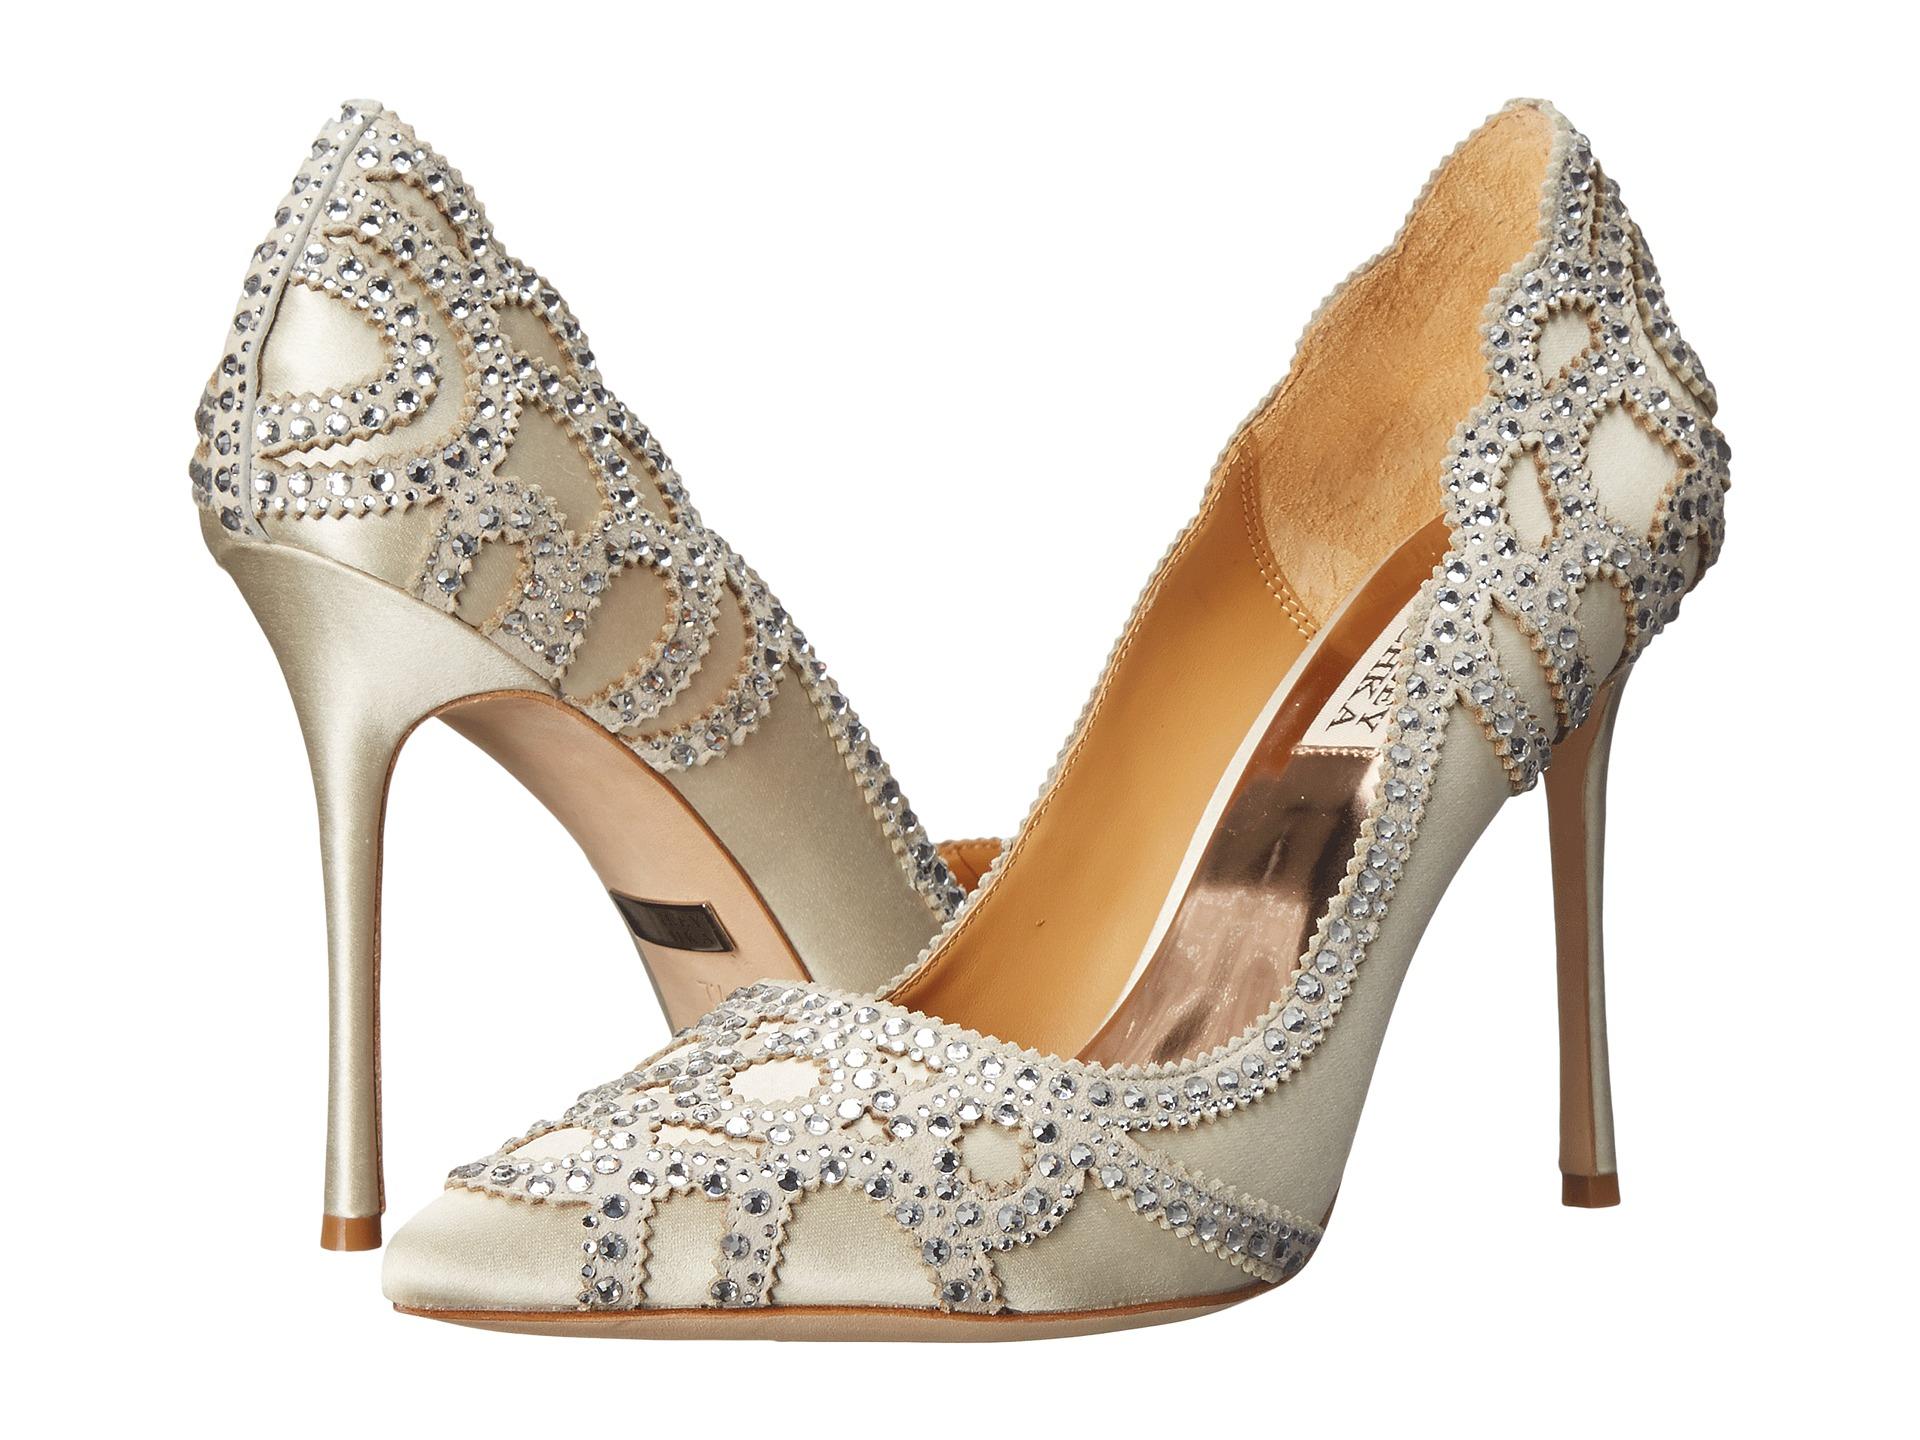 Badgley Mischka Reviews Shoes